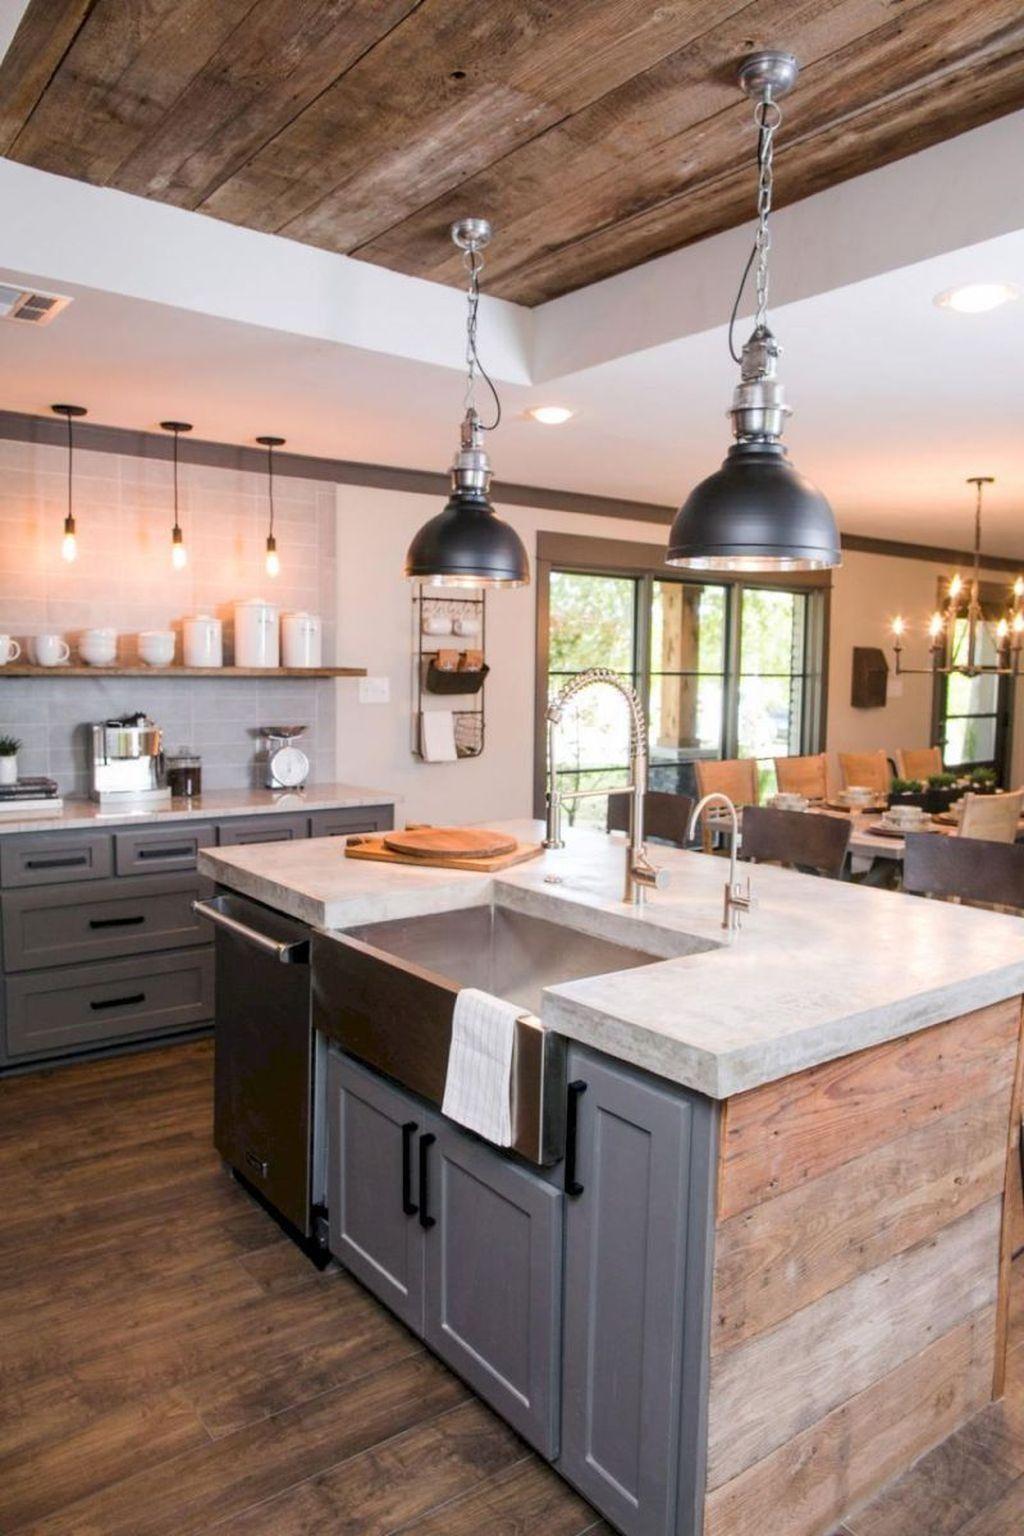 Awesome 67 Adorable Rustic Farmhouse Kitchen Design